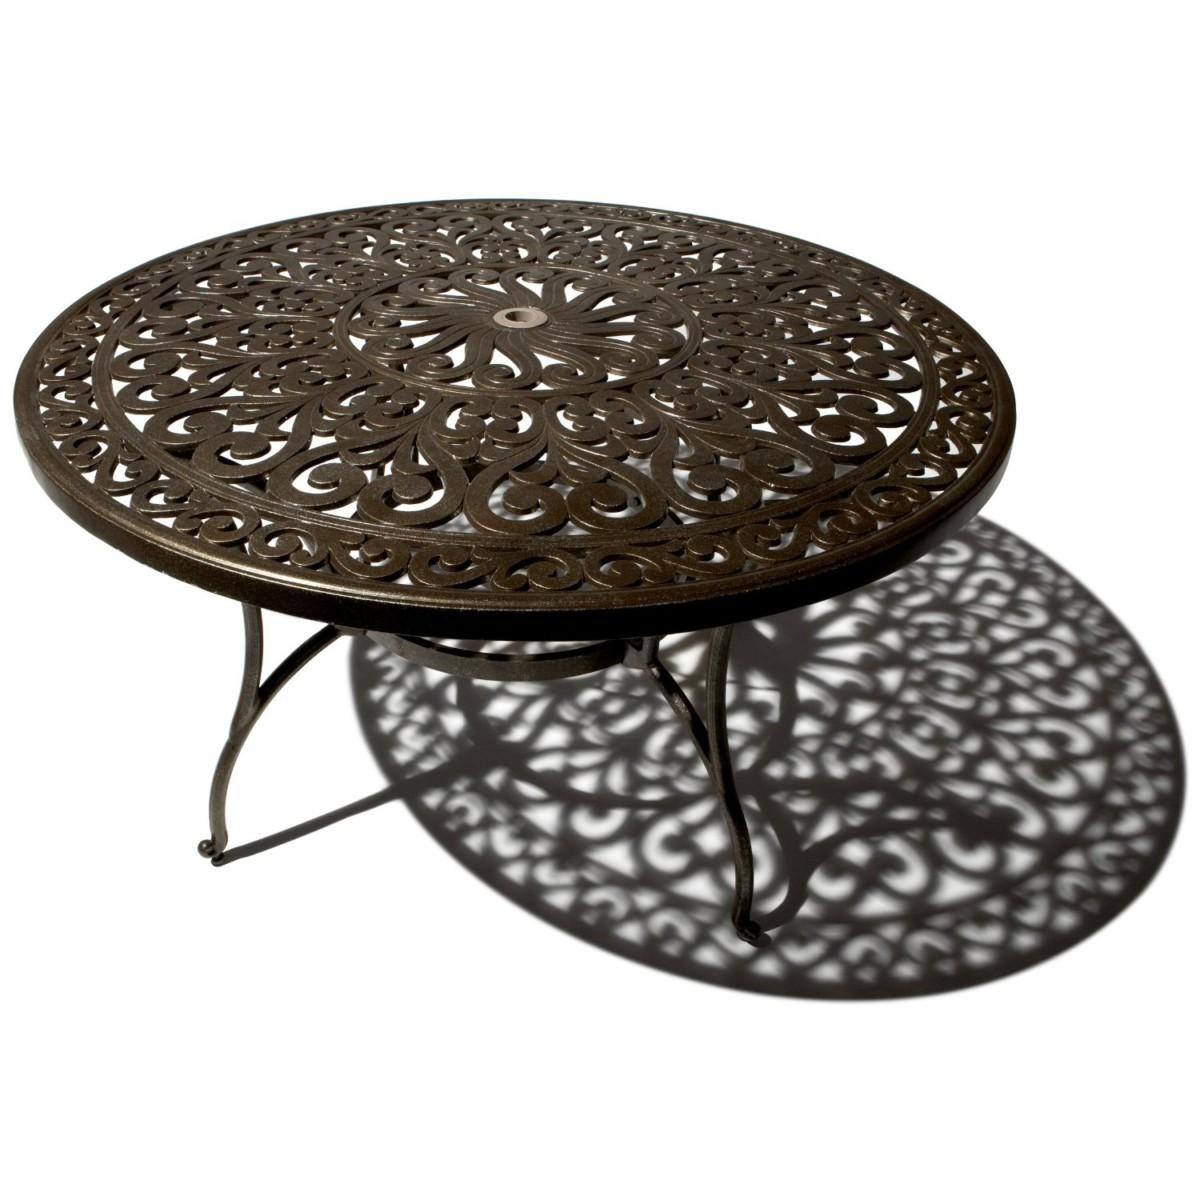 Thomas Table de jardin ronde en fonte d'aluminium: Jardin